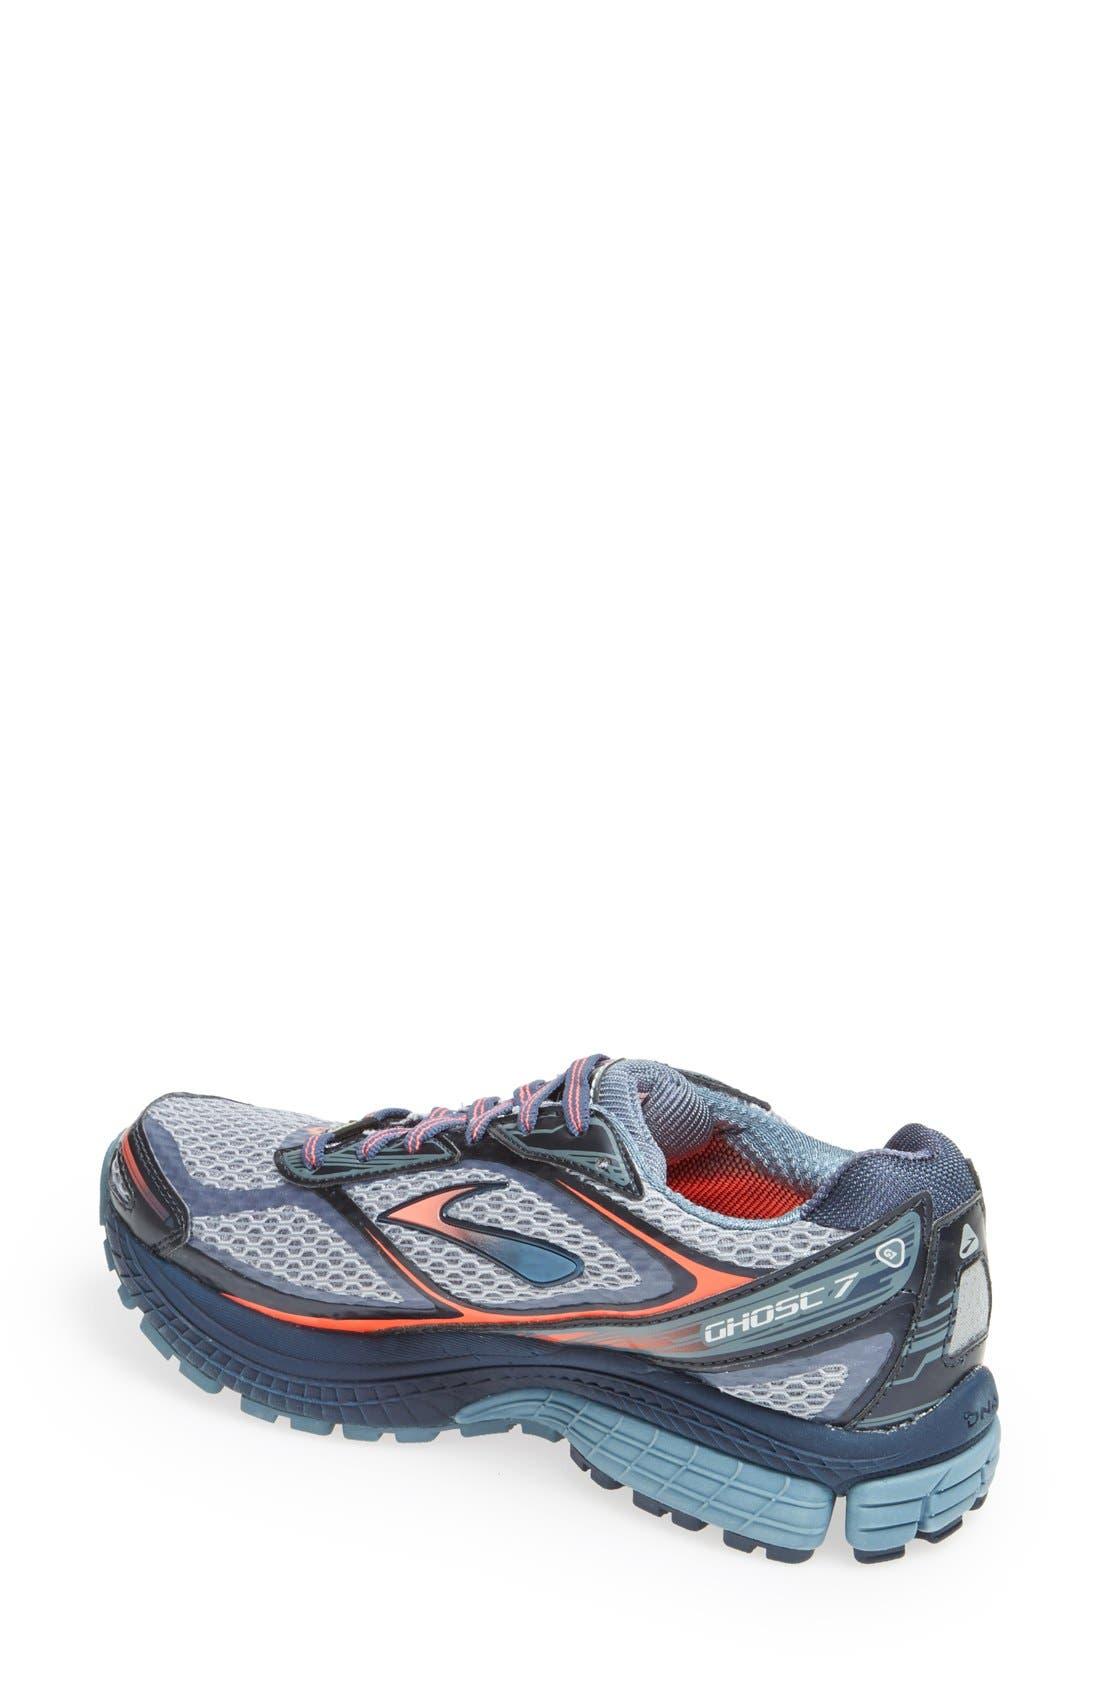 Alternate Image 2  - Brooks 'Ghost 7 GTX' Waterproof Running Shoe (Women)